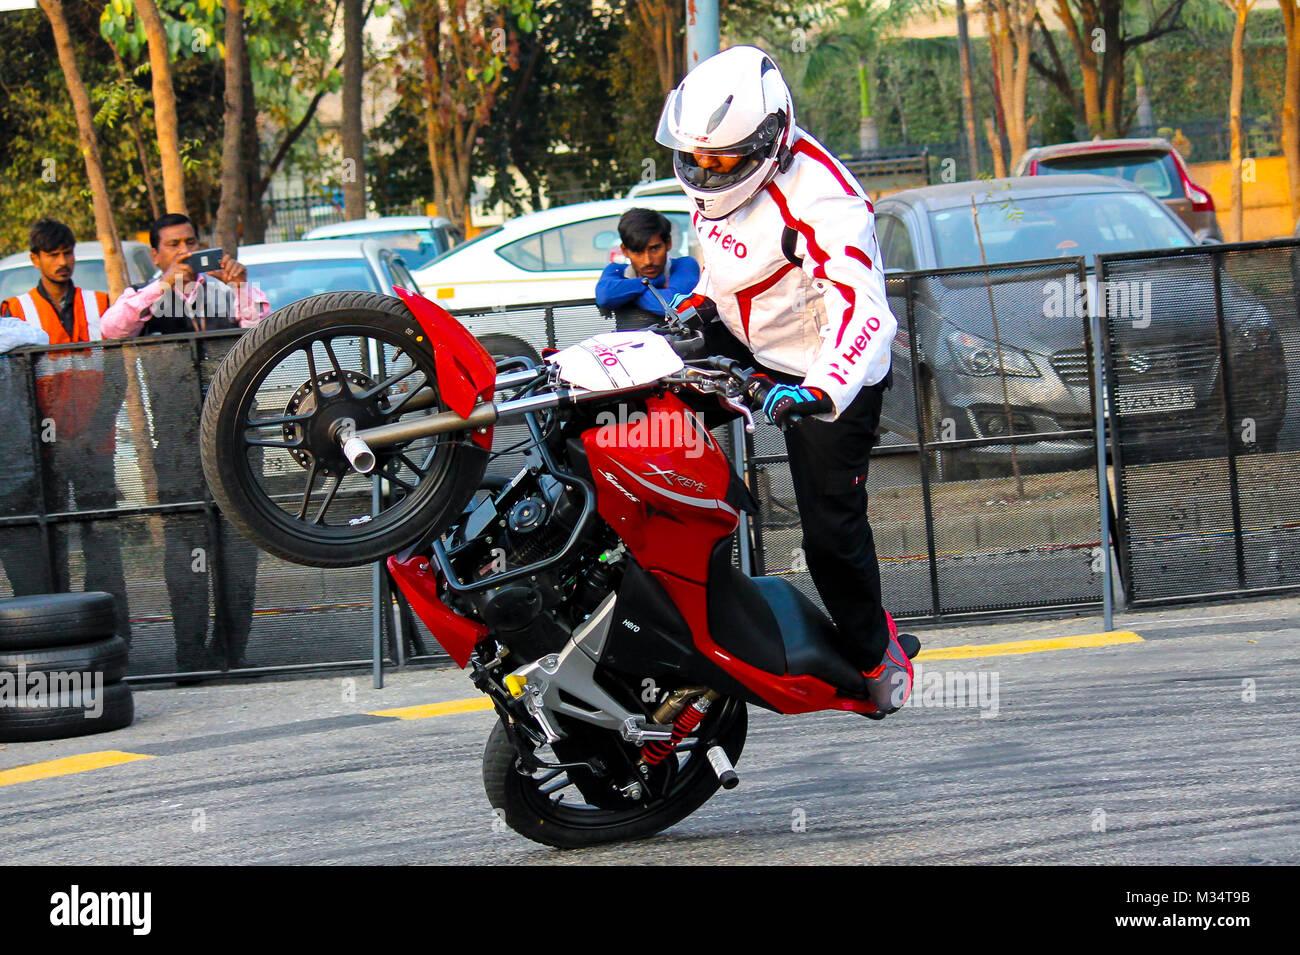 India Expo Mart, Noida, Utter Pradesh, India. 08th February, 2018. Hero Stunt man performing motor bike stunts in - Stock Image